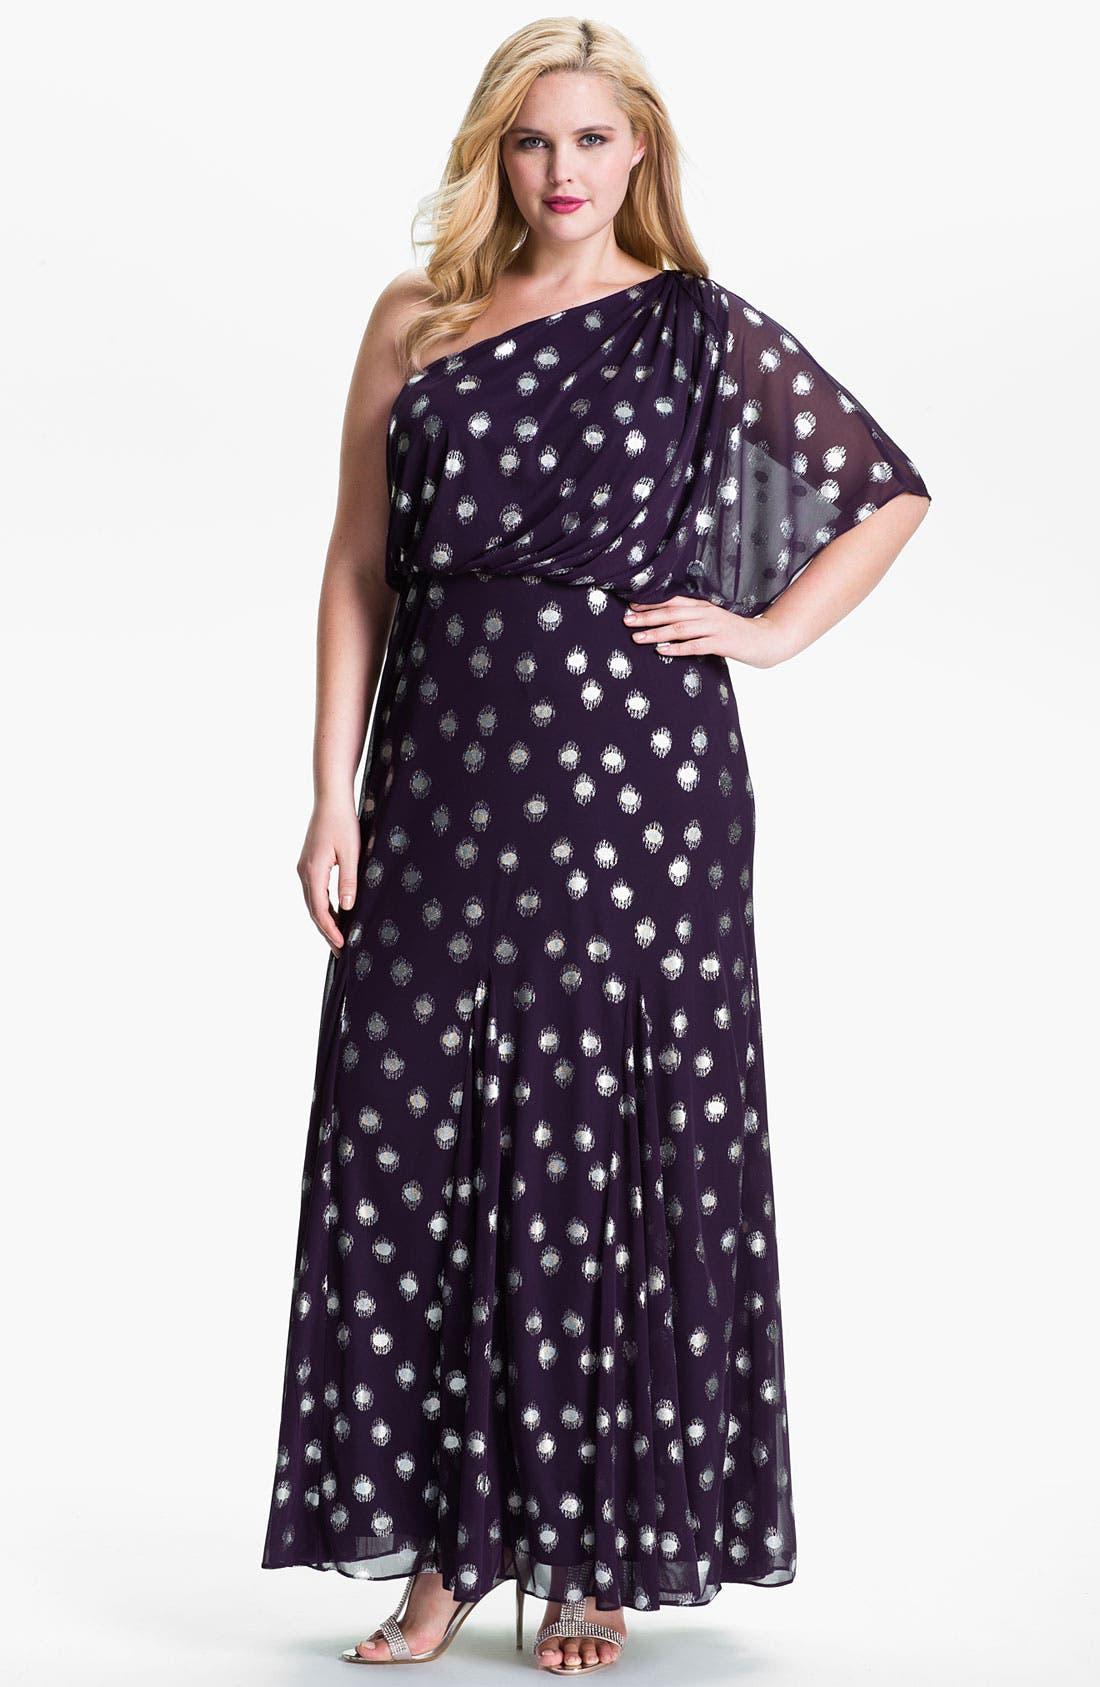 Main Image - Adrianna Papell Foil Dot One Shoulder Chiffon Dress (Plus)